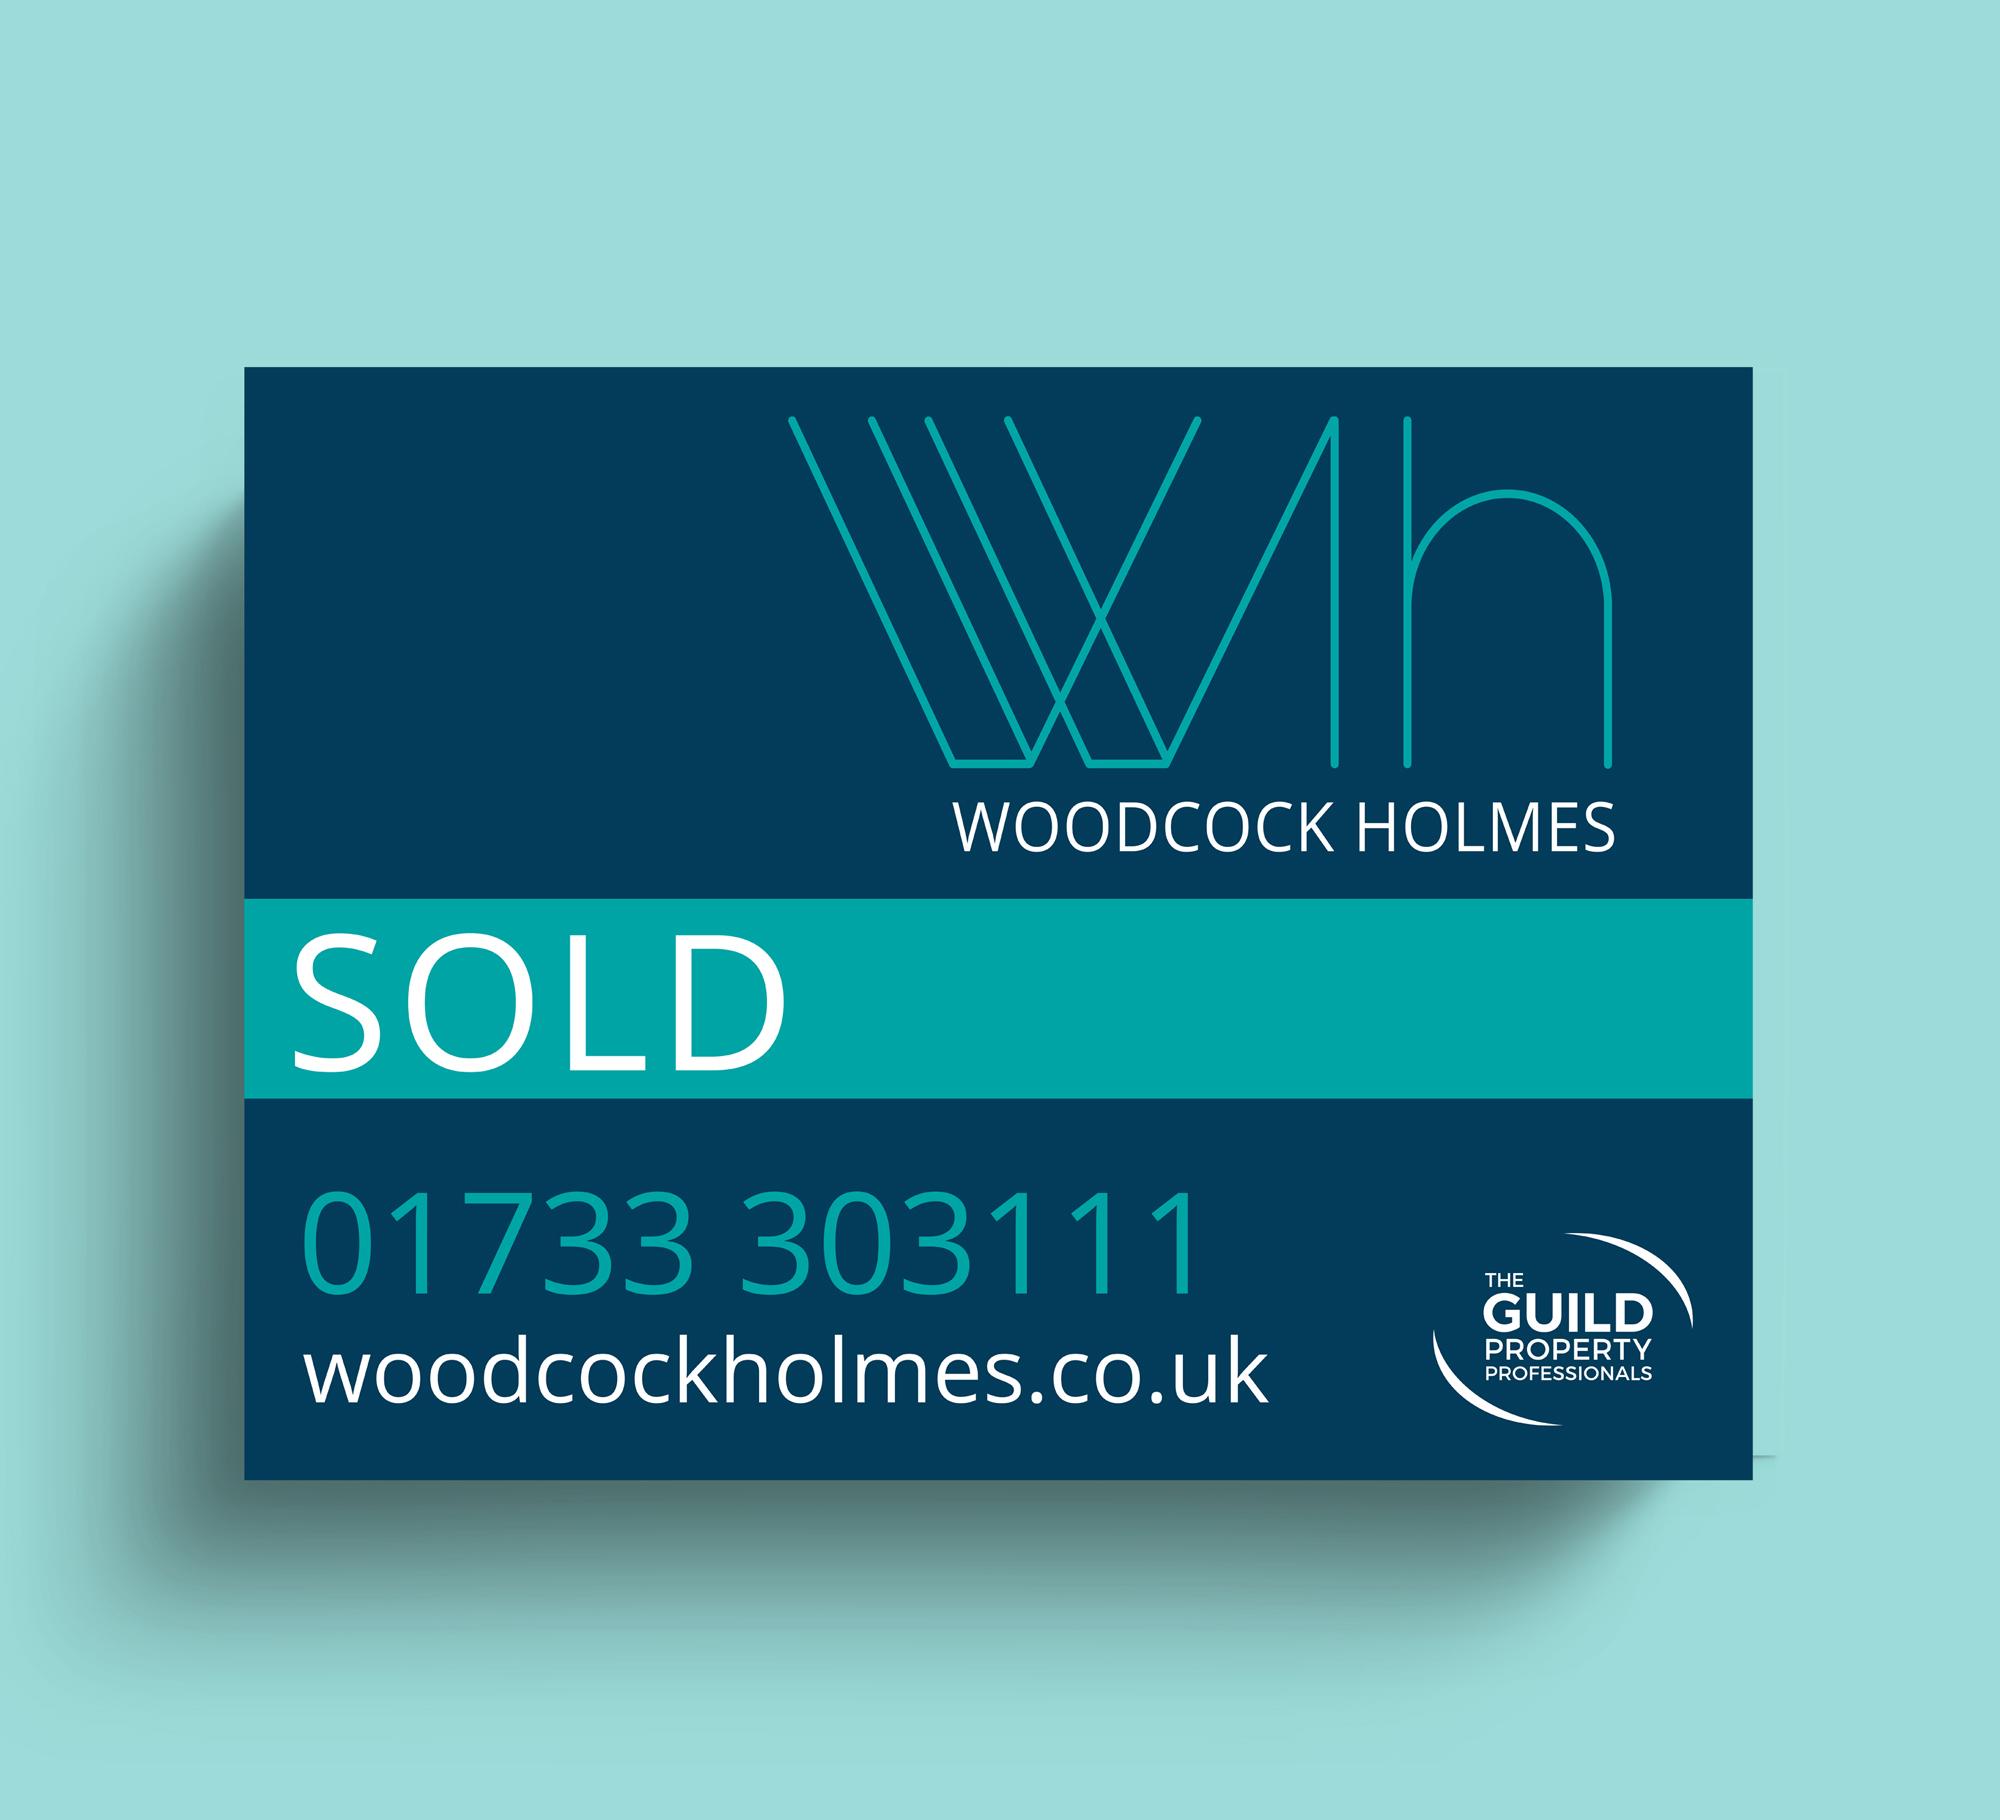 _woodcock_holmes_board